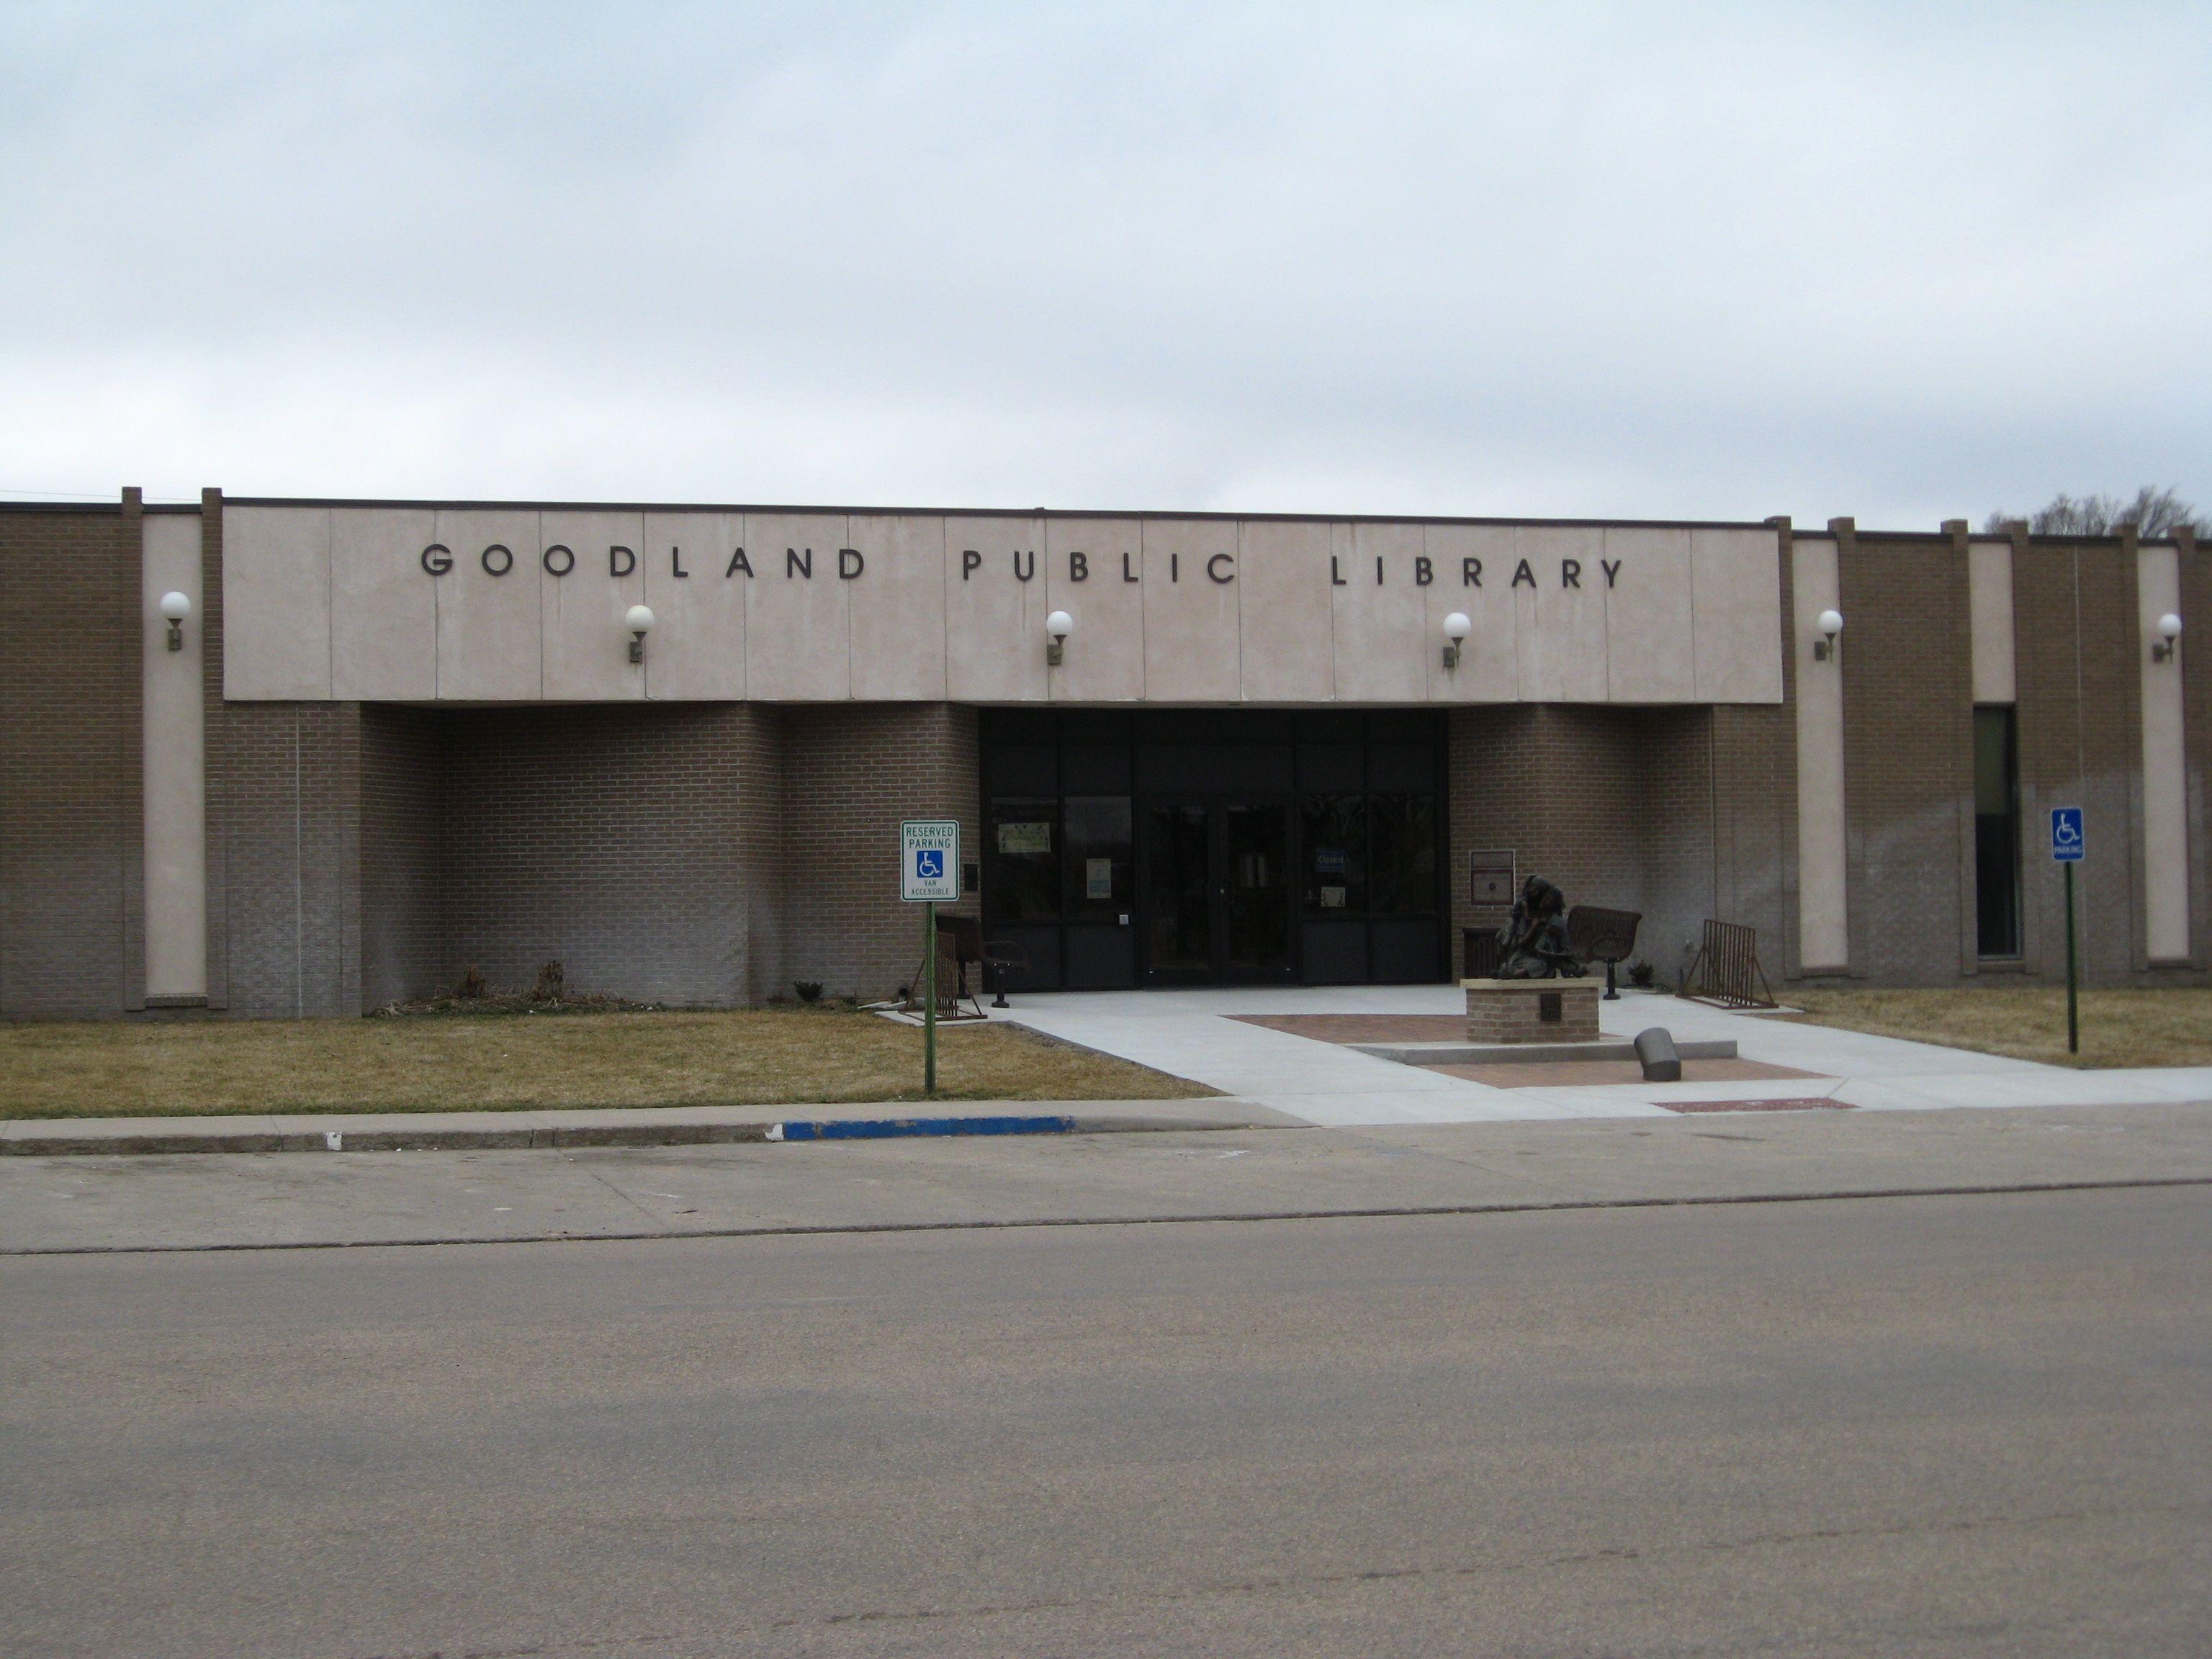 Goodland Public Library in Goodland, Kansas